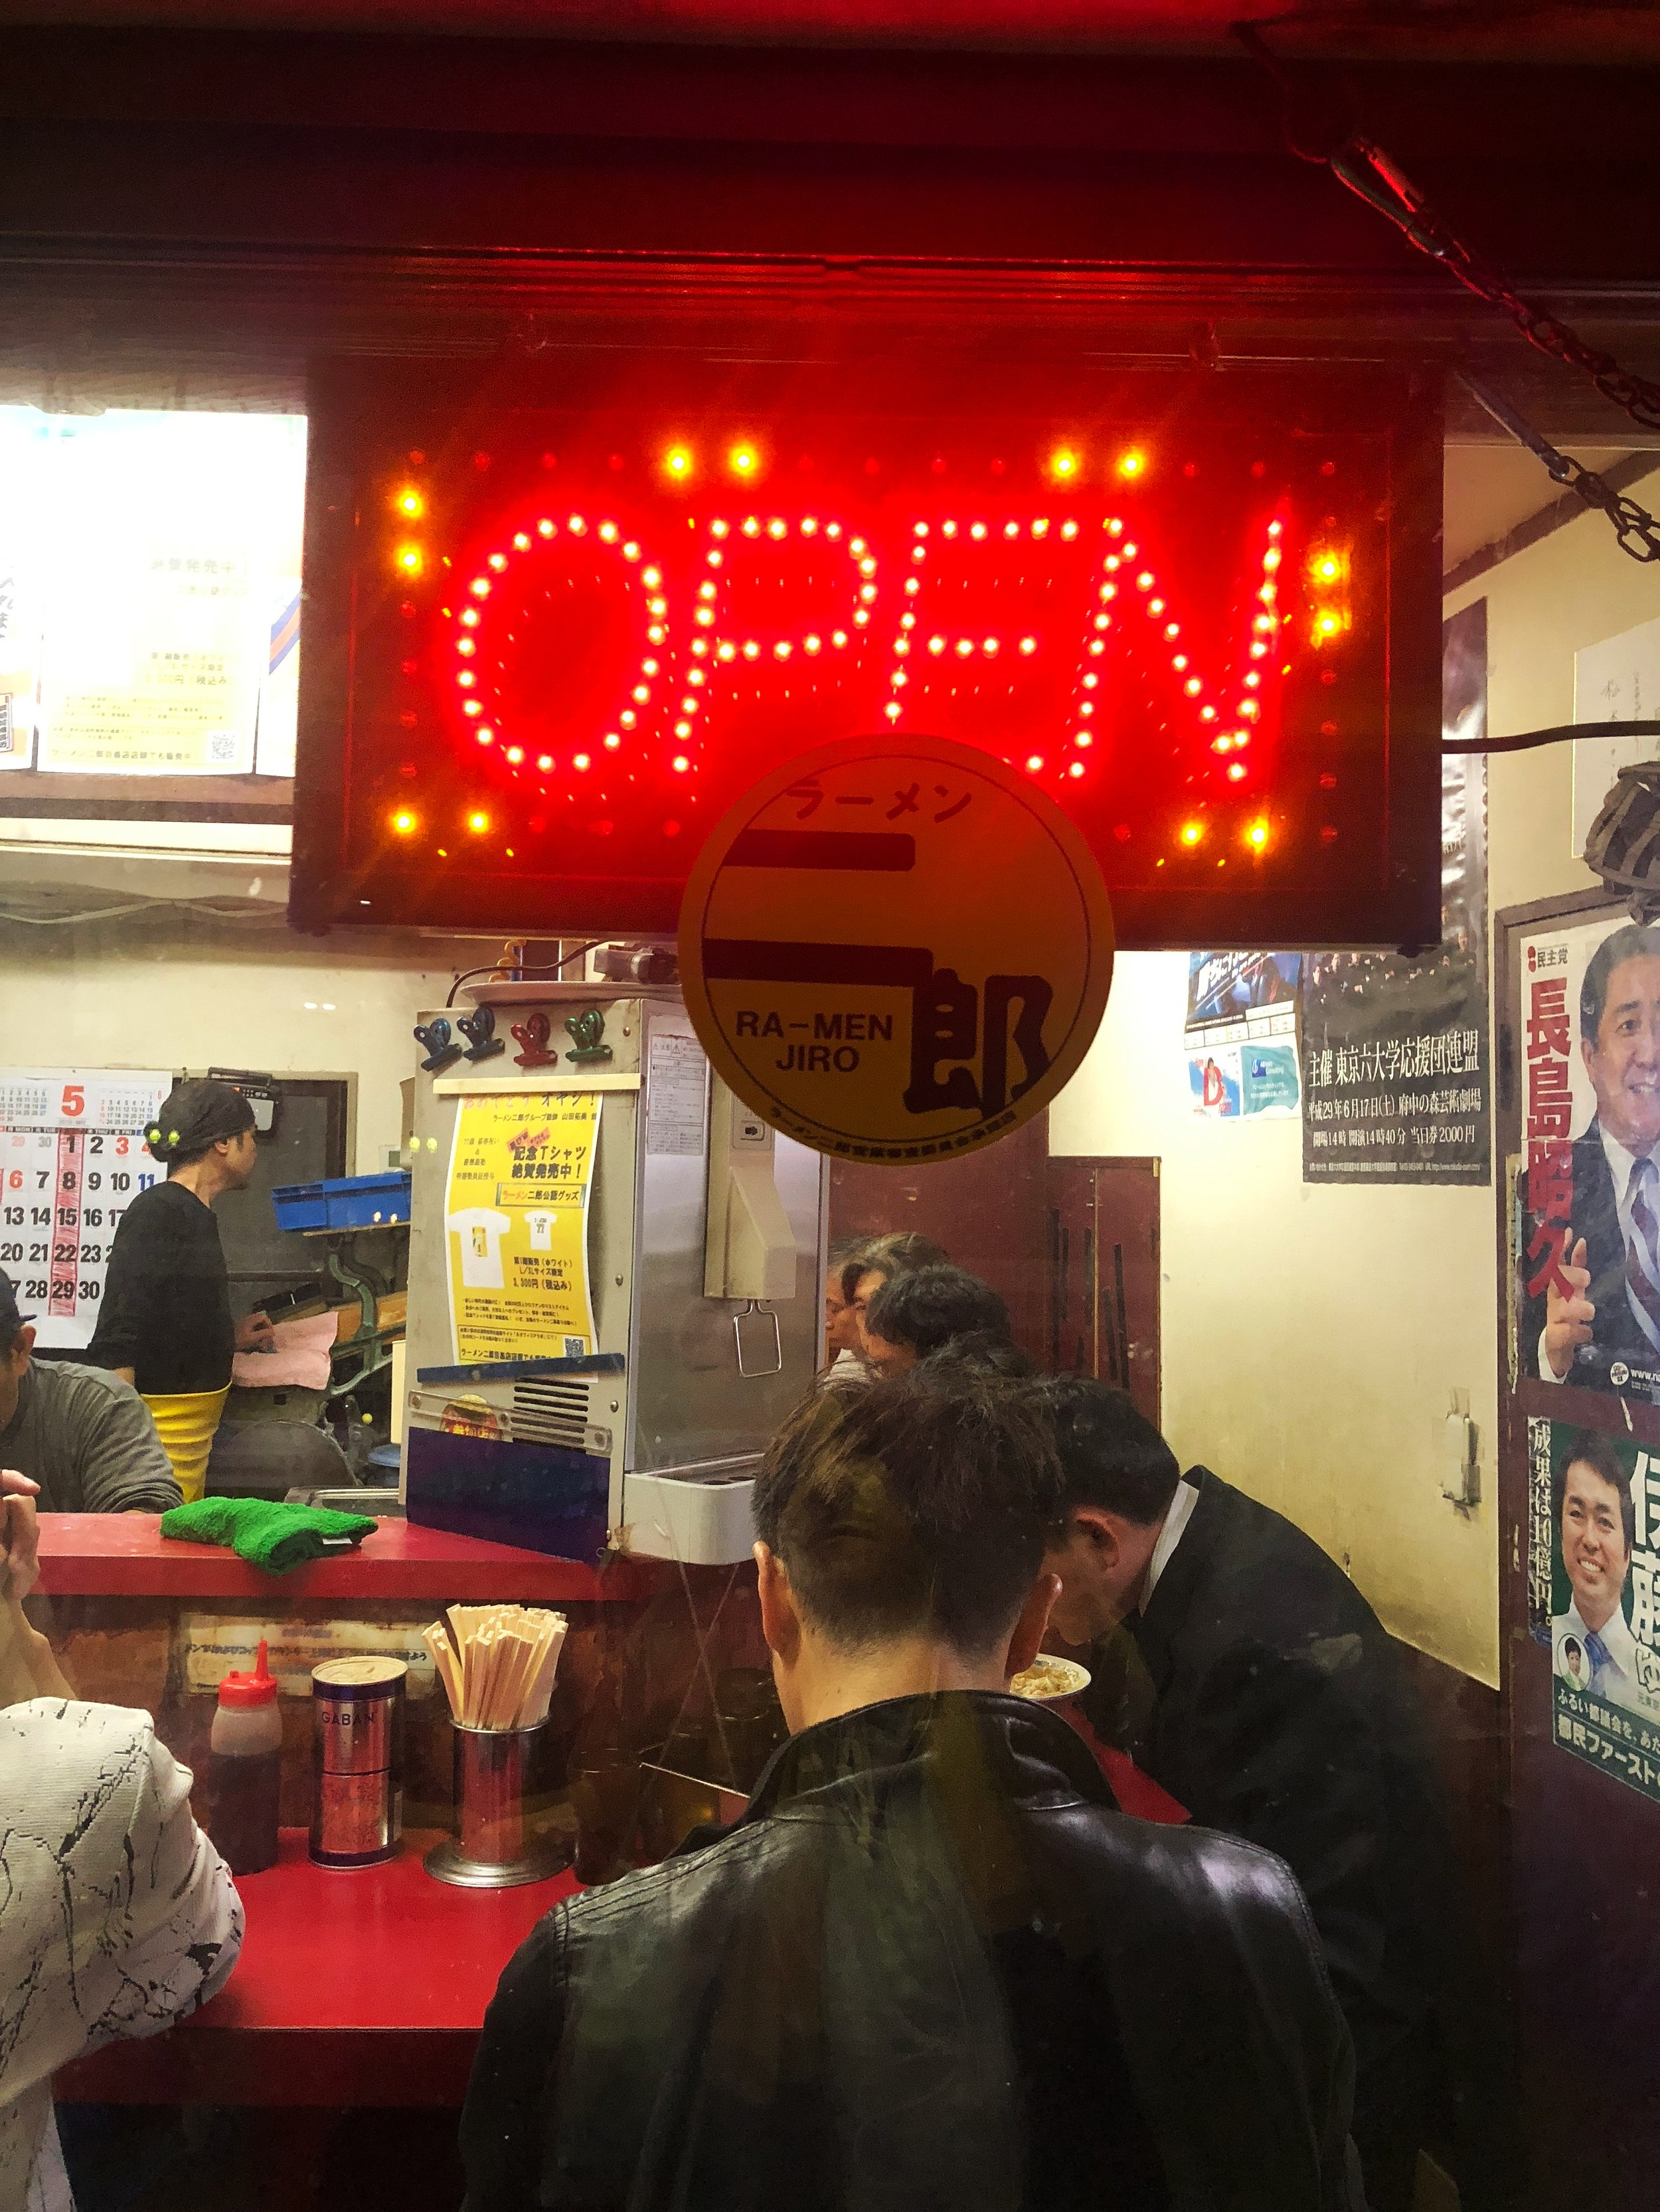 ramen-ramenjiro-tokyo-japanfoodtour-japanfoodtrips-ramentour-tokyofoodtour-open.JPG